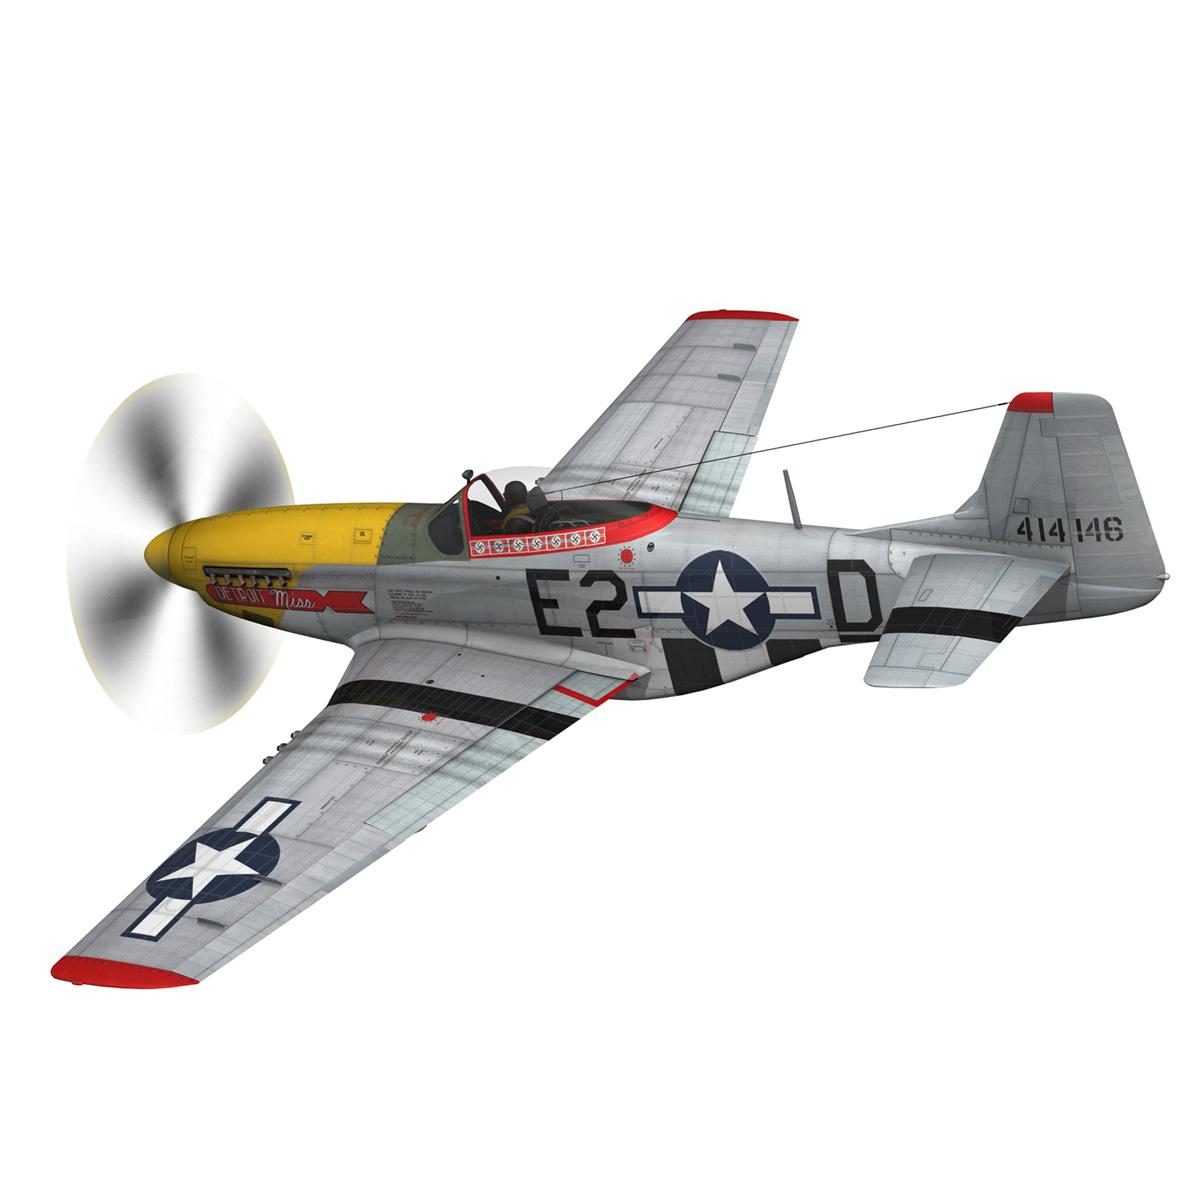 north american p-51d – mustang – detroit miss 3d model 3ds fbx c4d lwo obj 267596